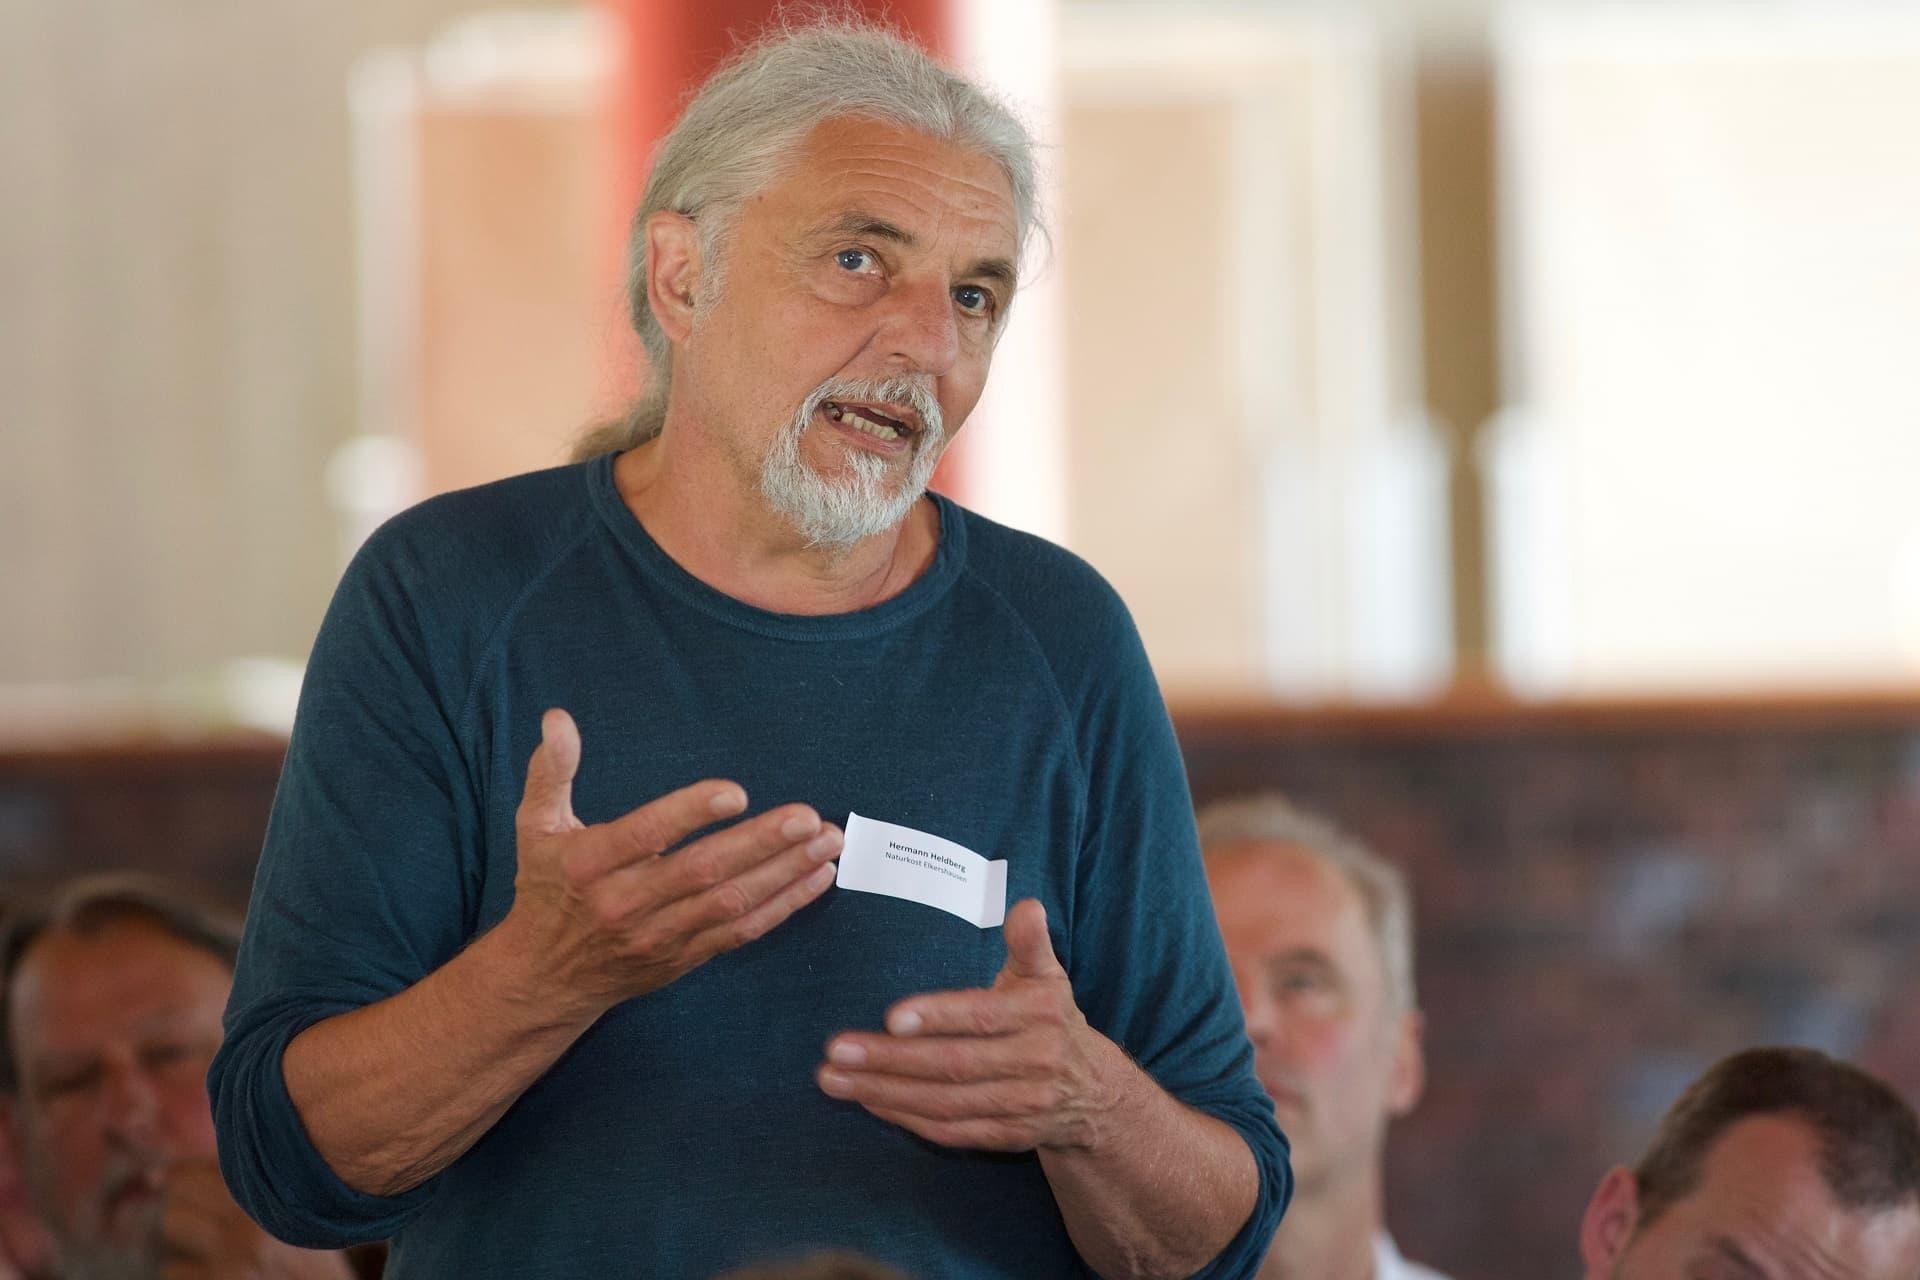 Teilnehmer am Marktgespräch